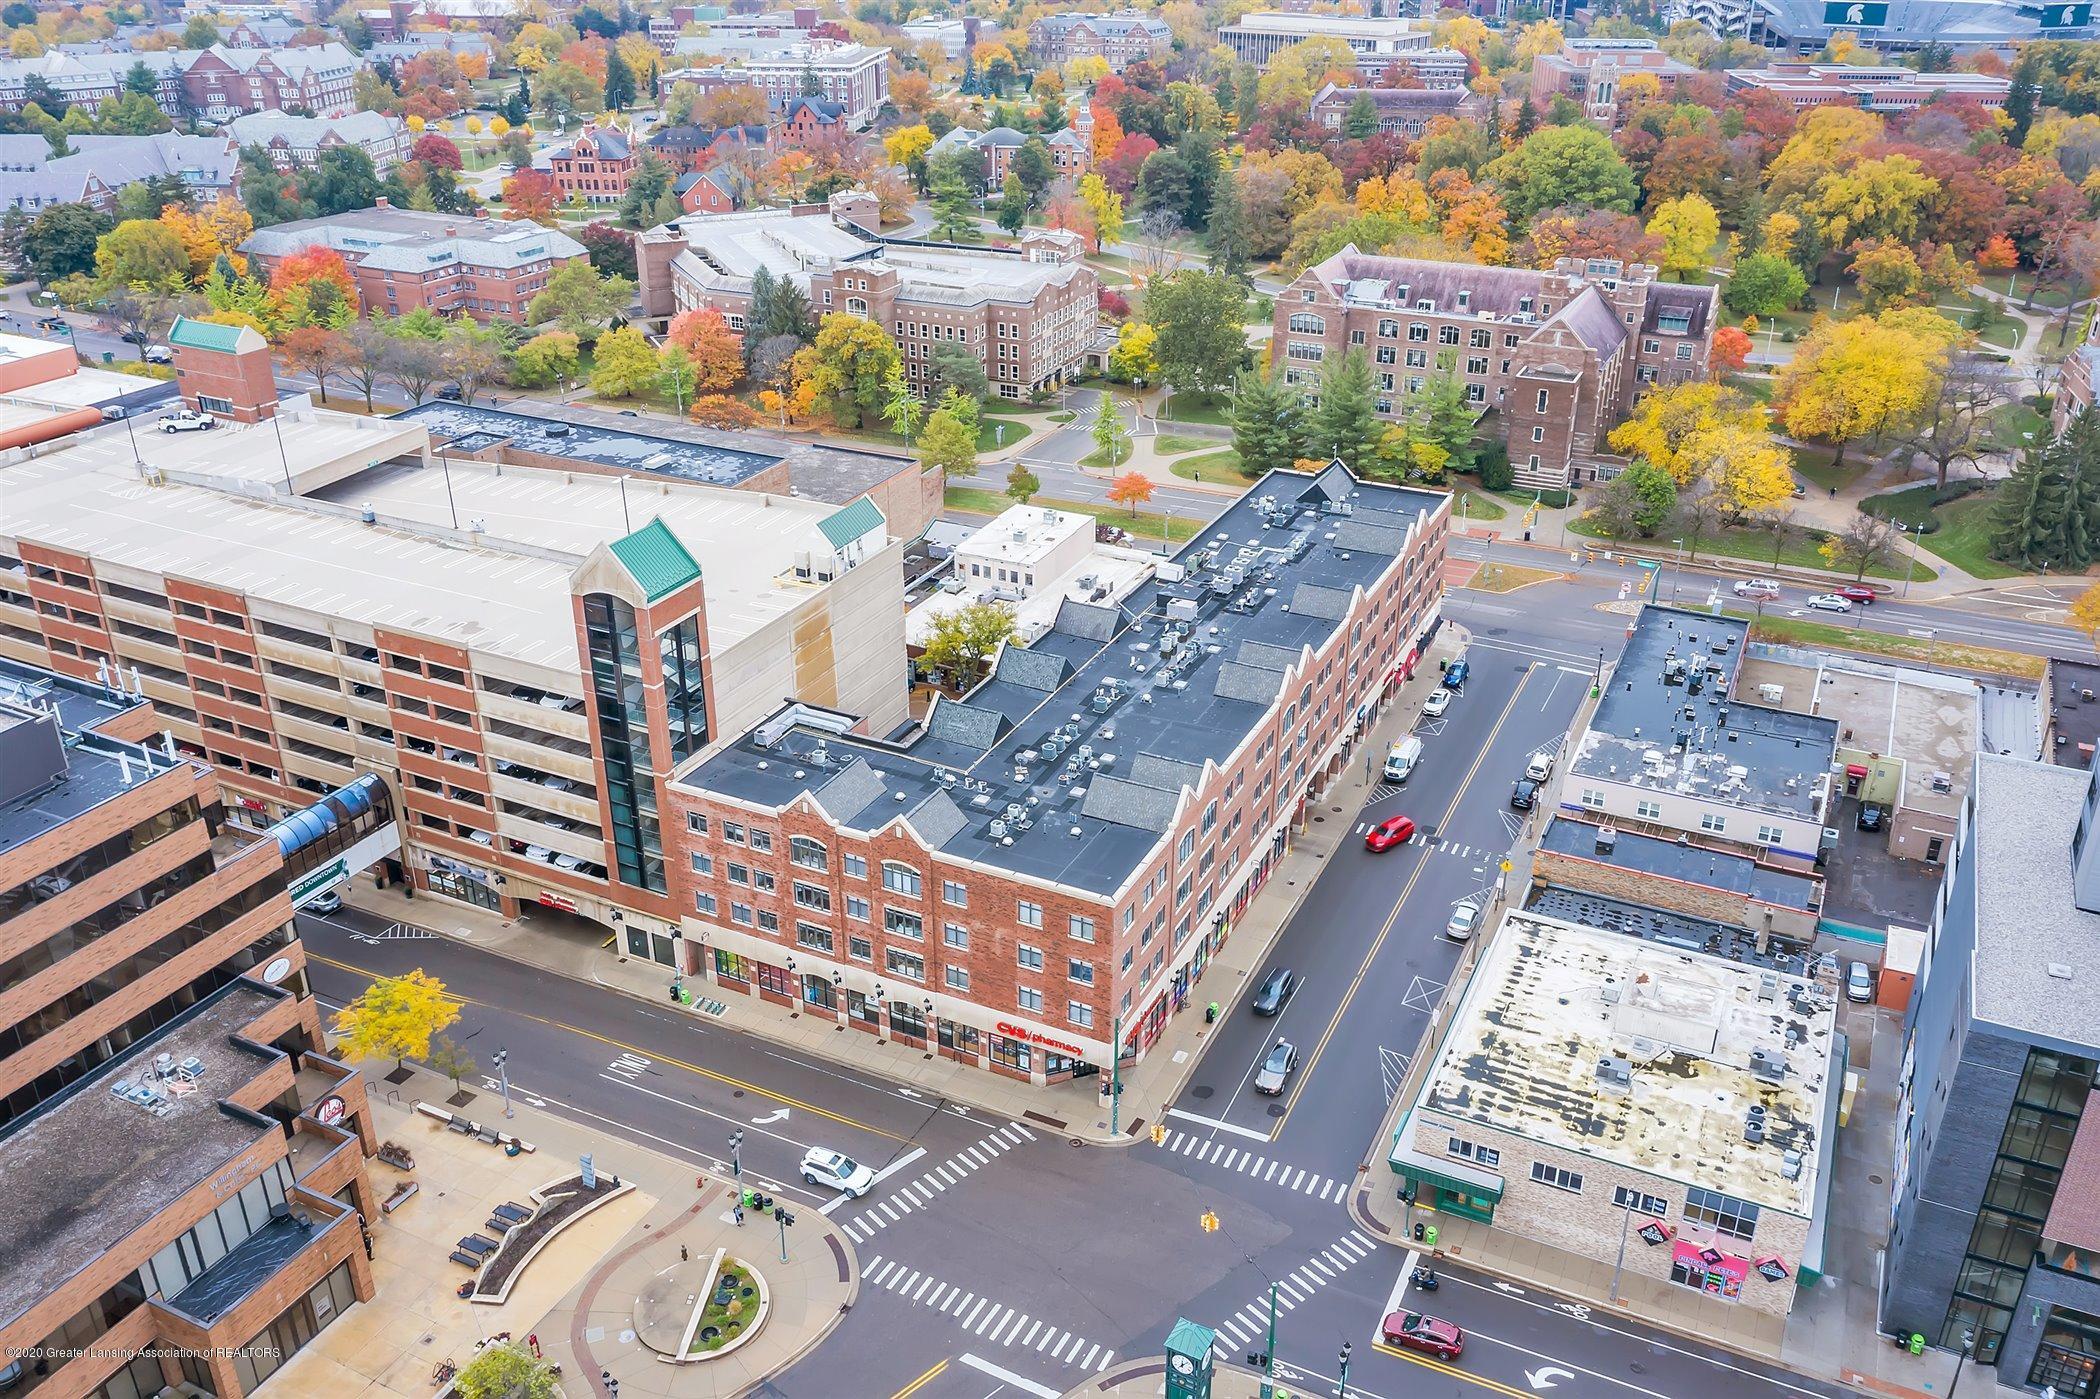 220 M. A. C. Ave Apt 409 - EXTERIOR Aerial View - 4